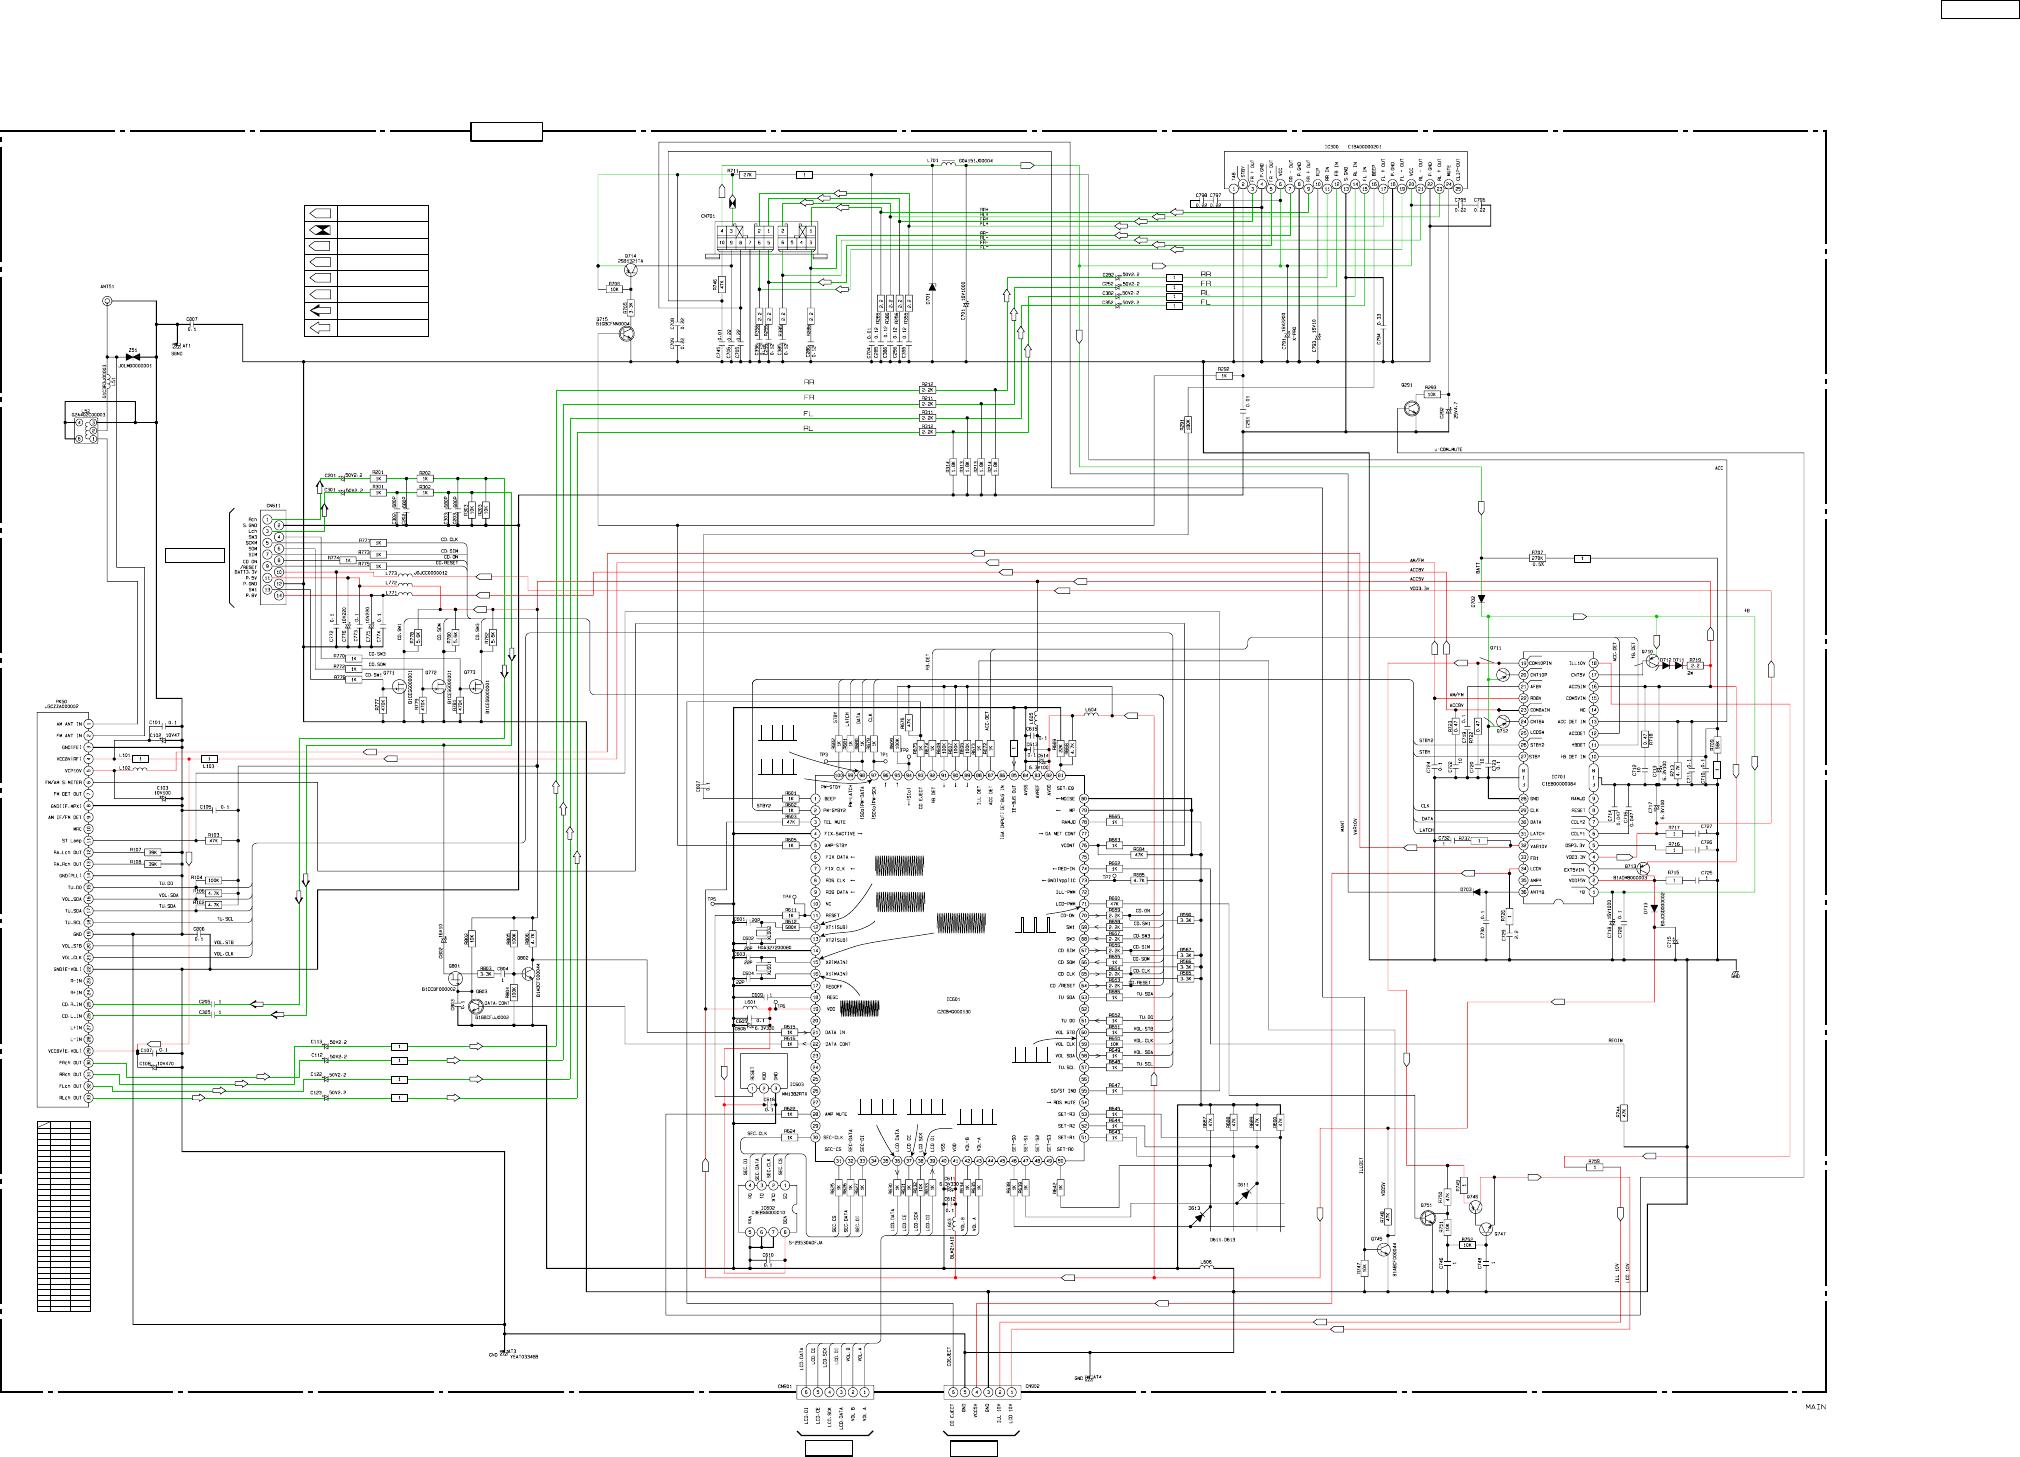 Cqjs0482 Circuit Diagram Ks1 12 Schematic 2